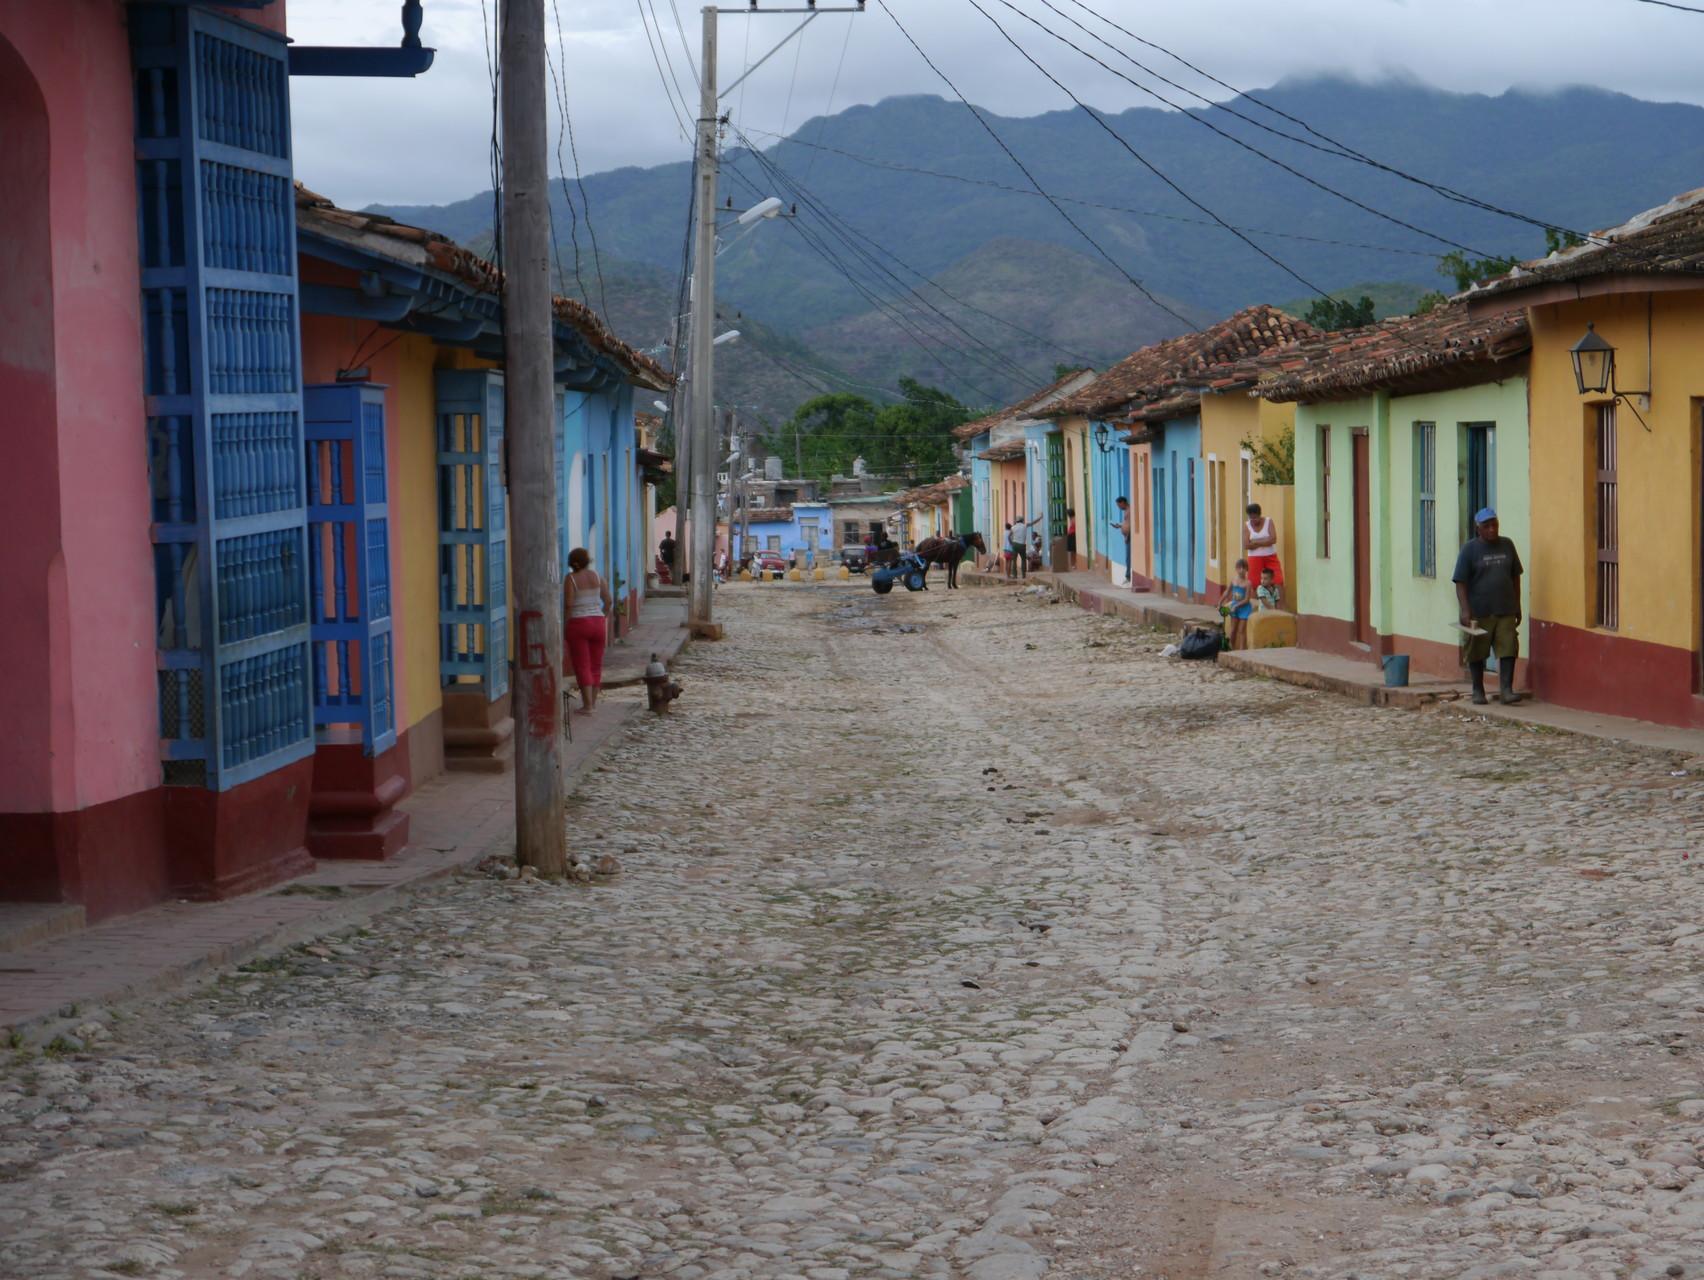 Straße in Trinidad